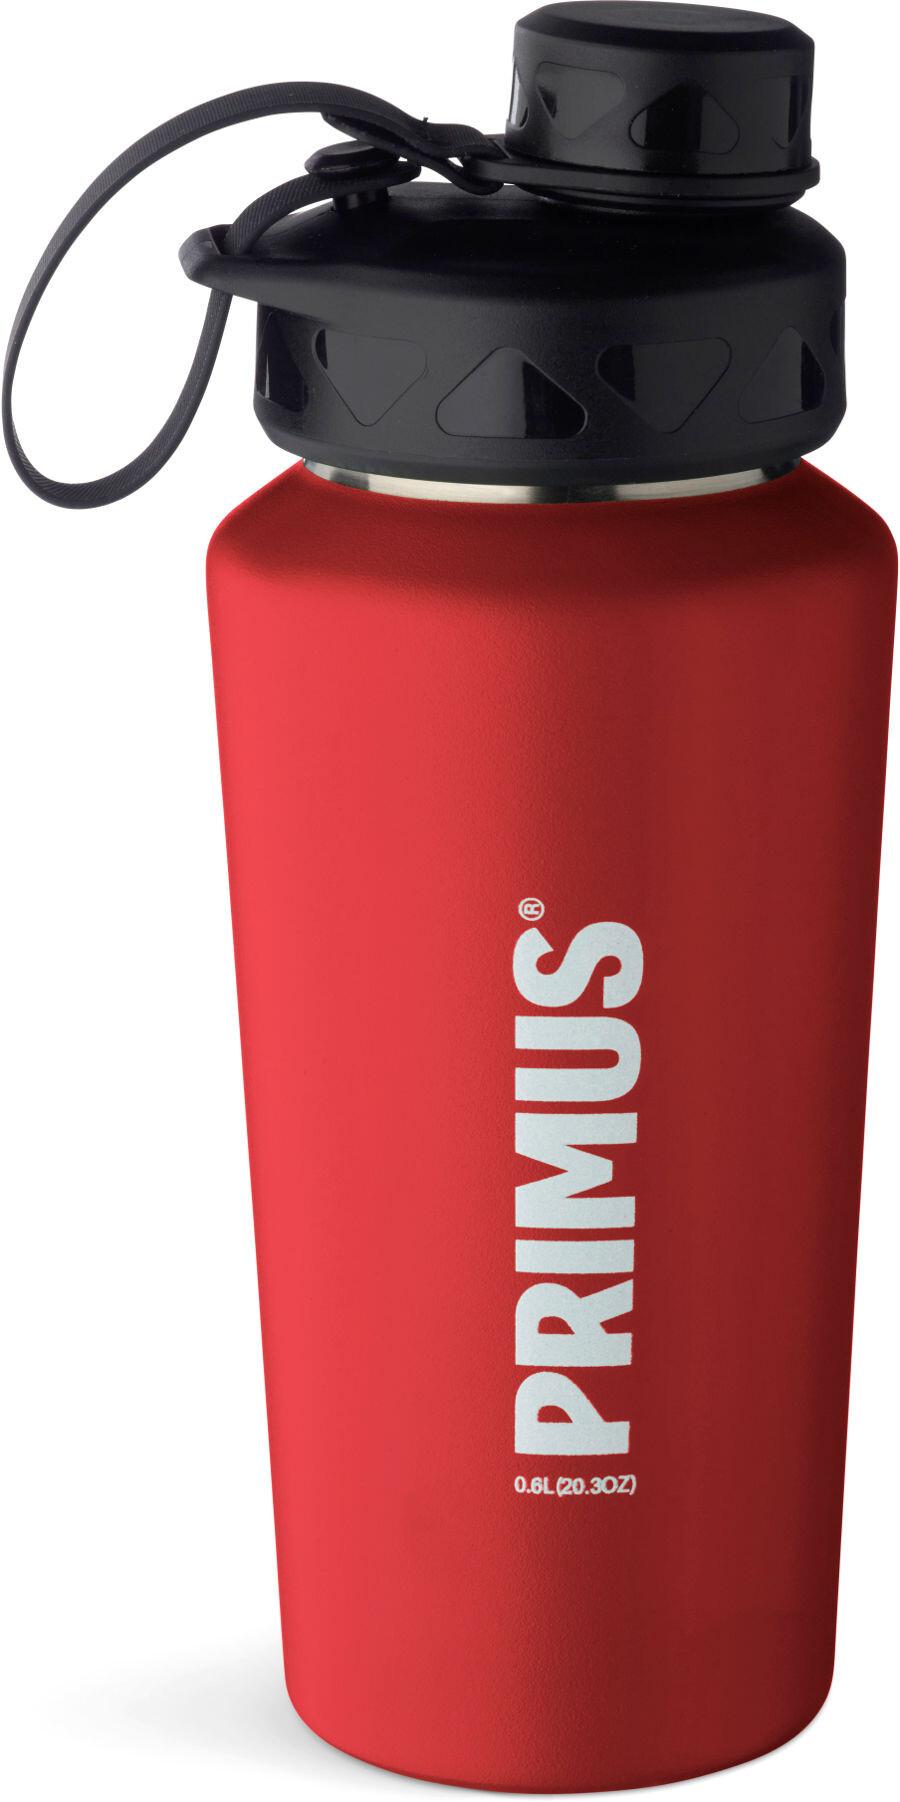 Primus TrailBottle Water Bottle Stainless Steel 600ml red